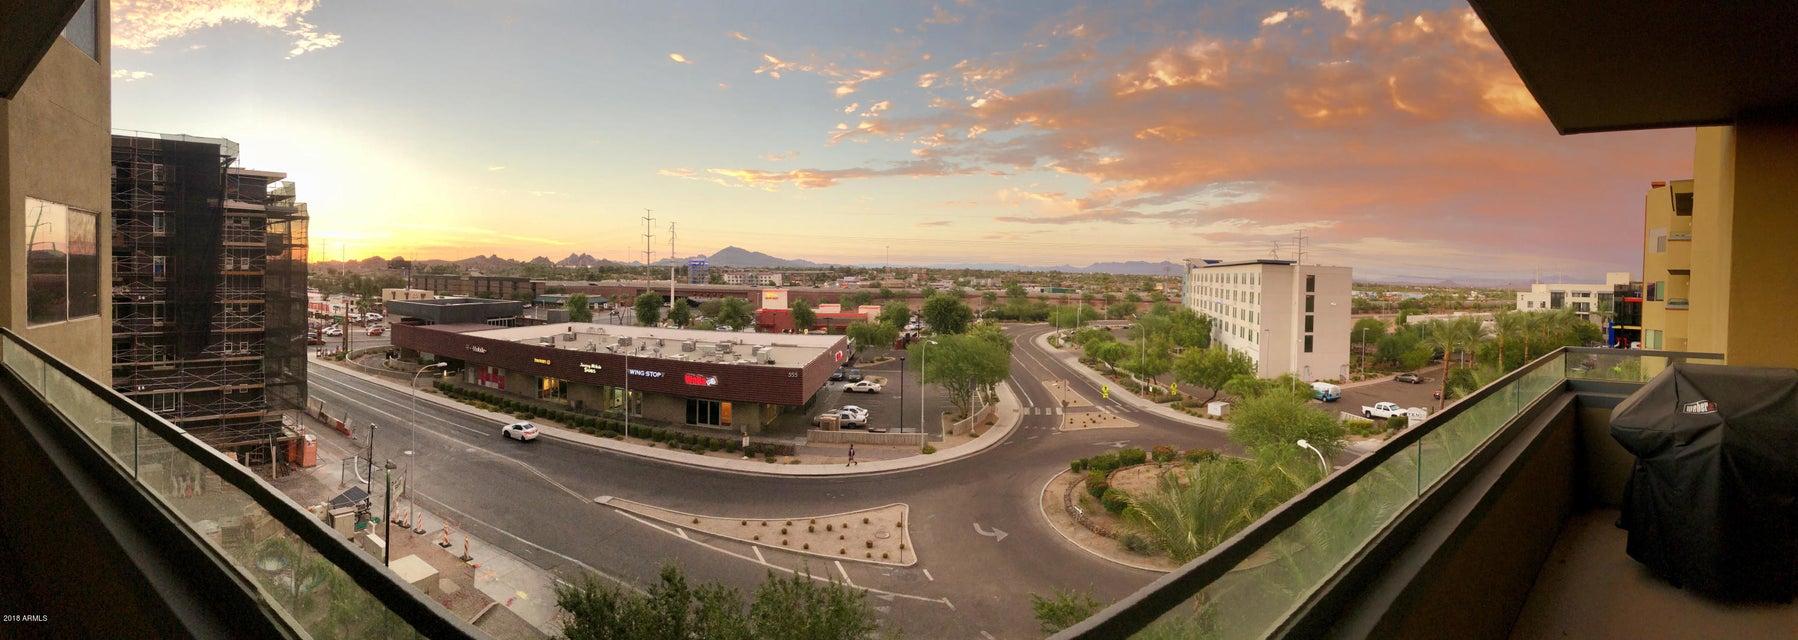 Photo of 945 E PLAYA DEL NORTE Drive #4024, Tempe, AZ 85281